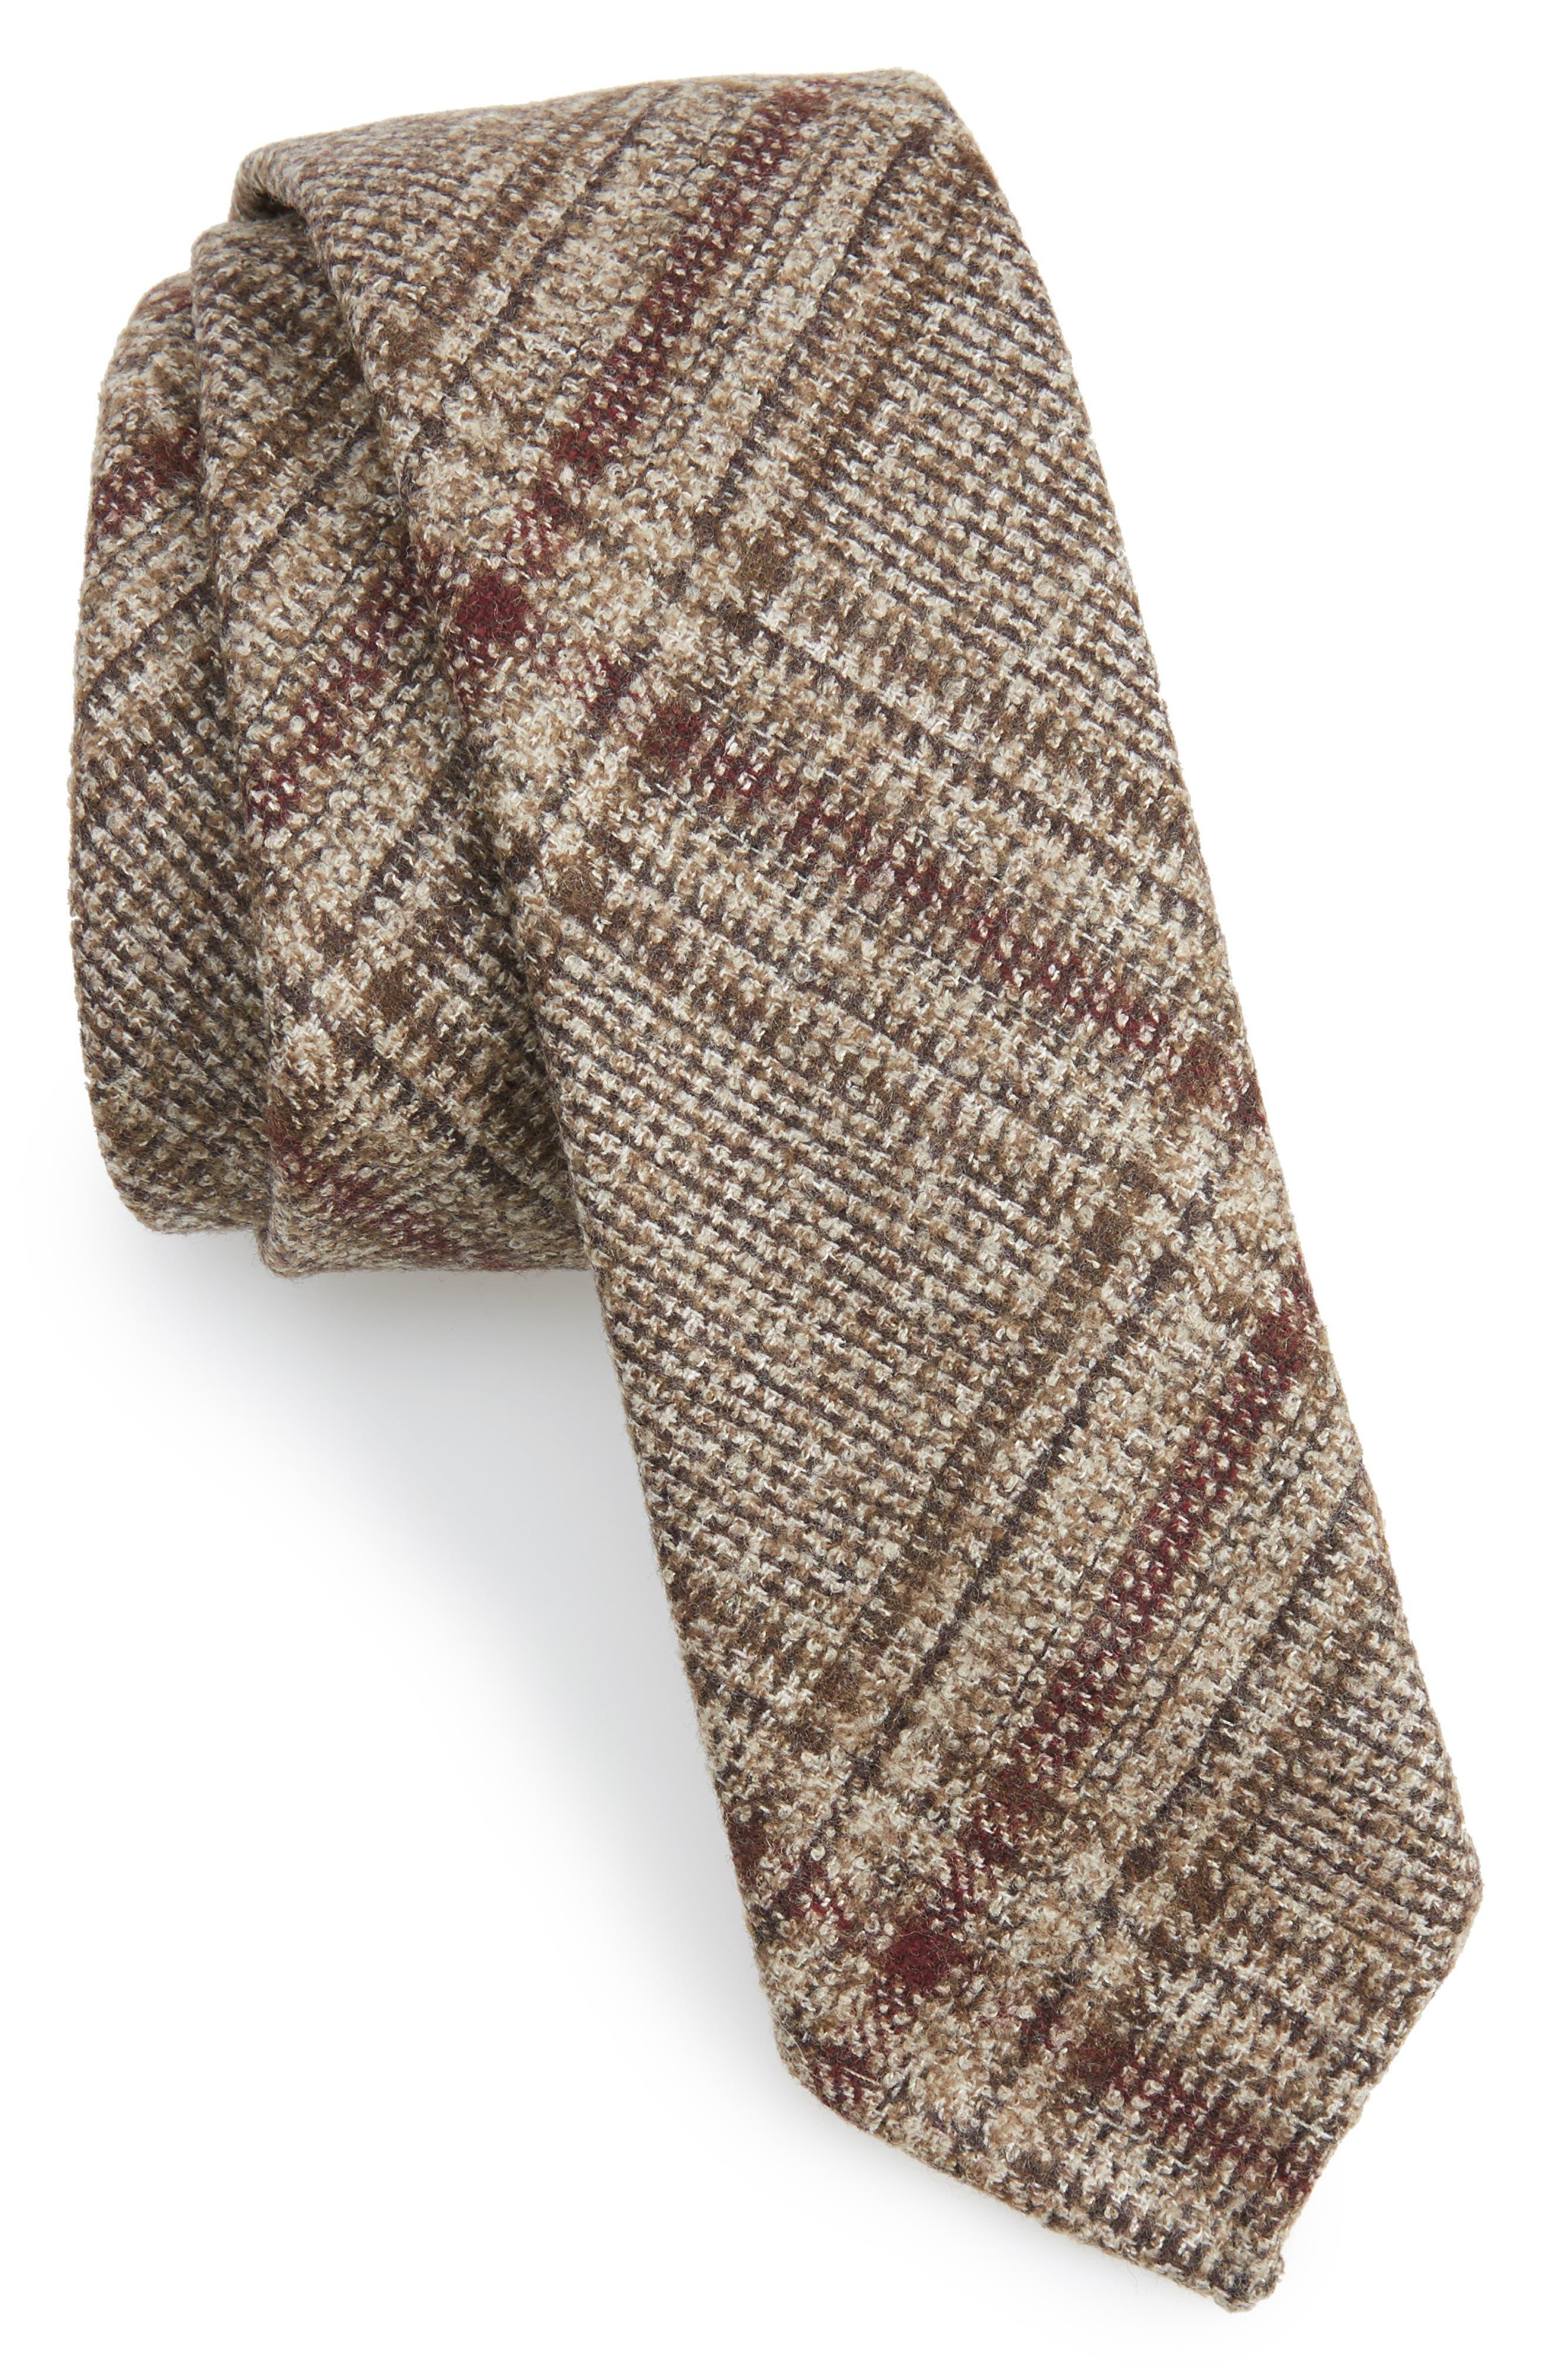 Glencheck Wool Blend Skinny Tie,                         Main,                         color, Dark Beige